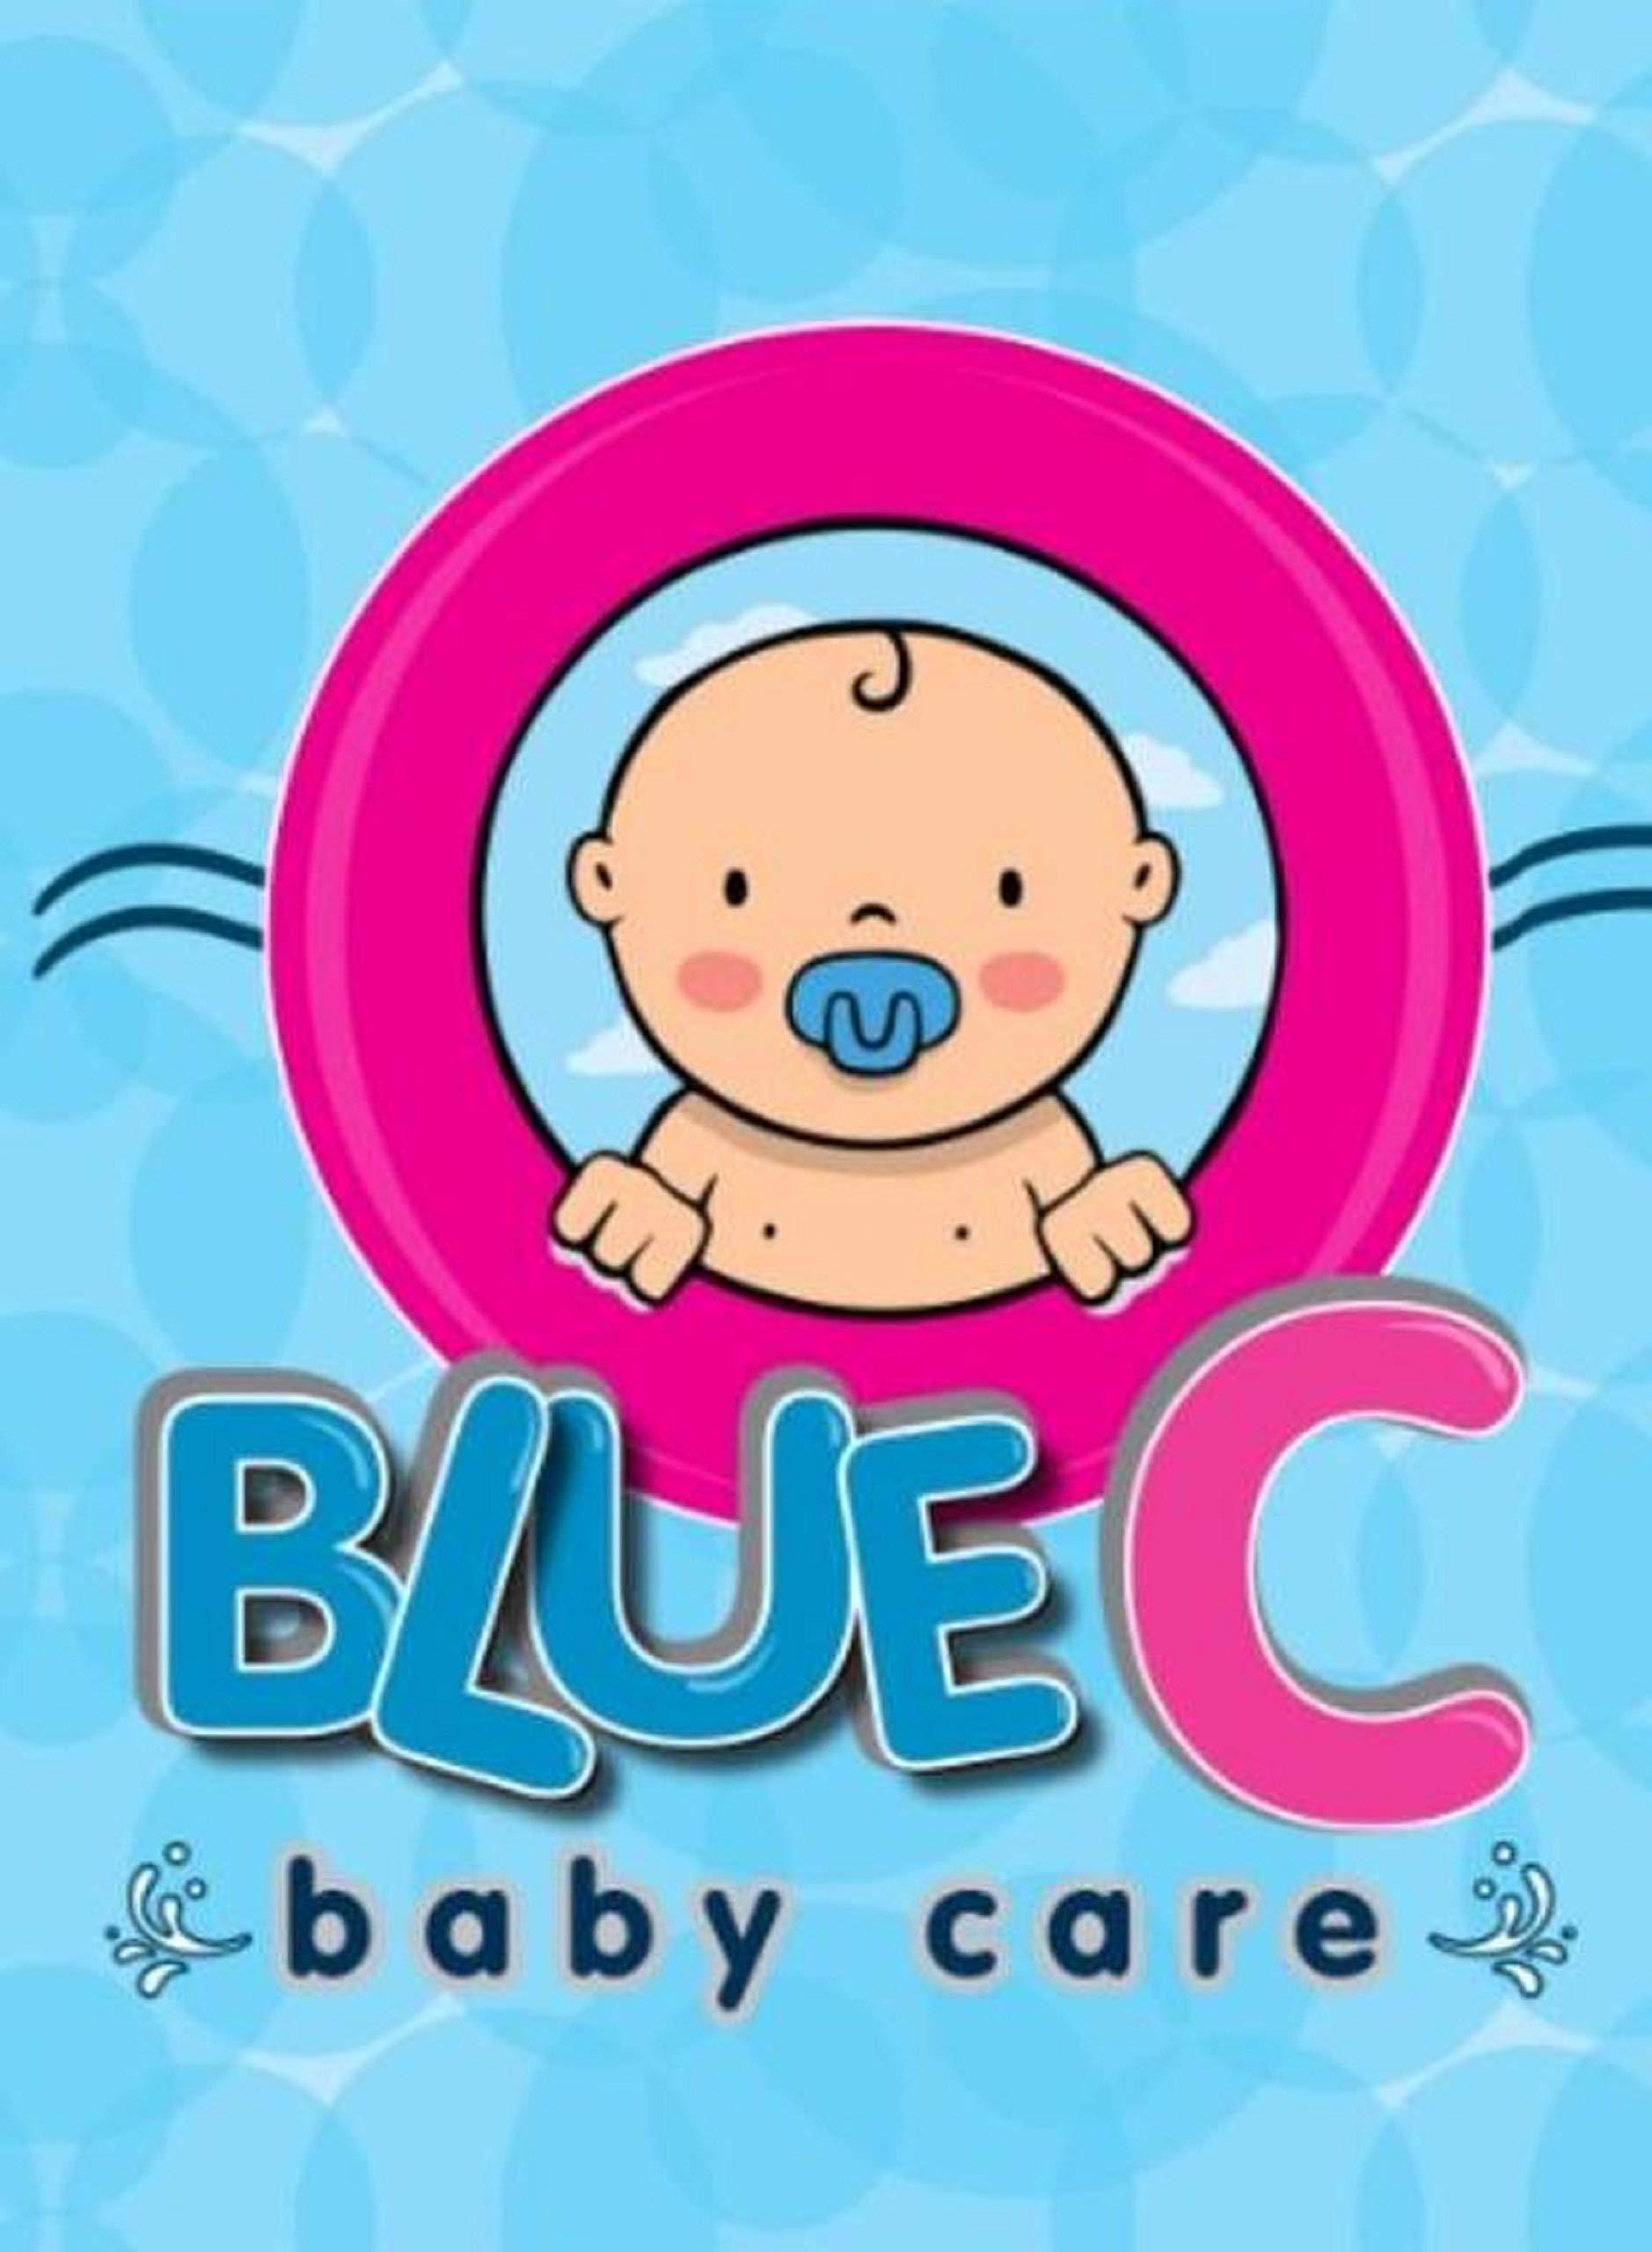 Himalaya Baby Care Baby Cream (50ml) by Himalaya beauty